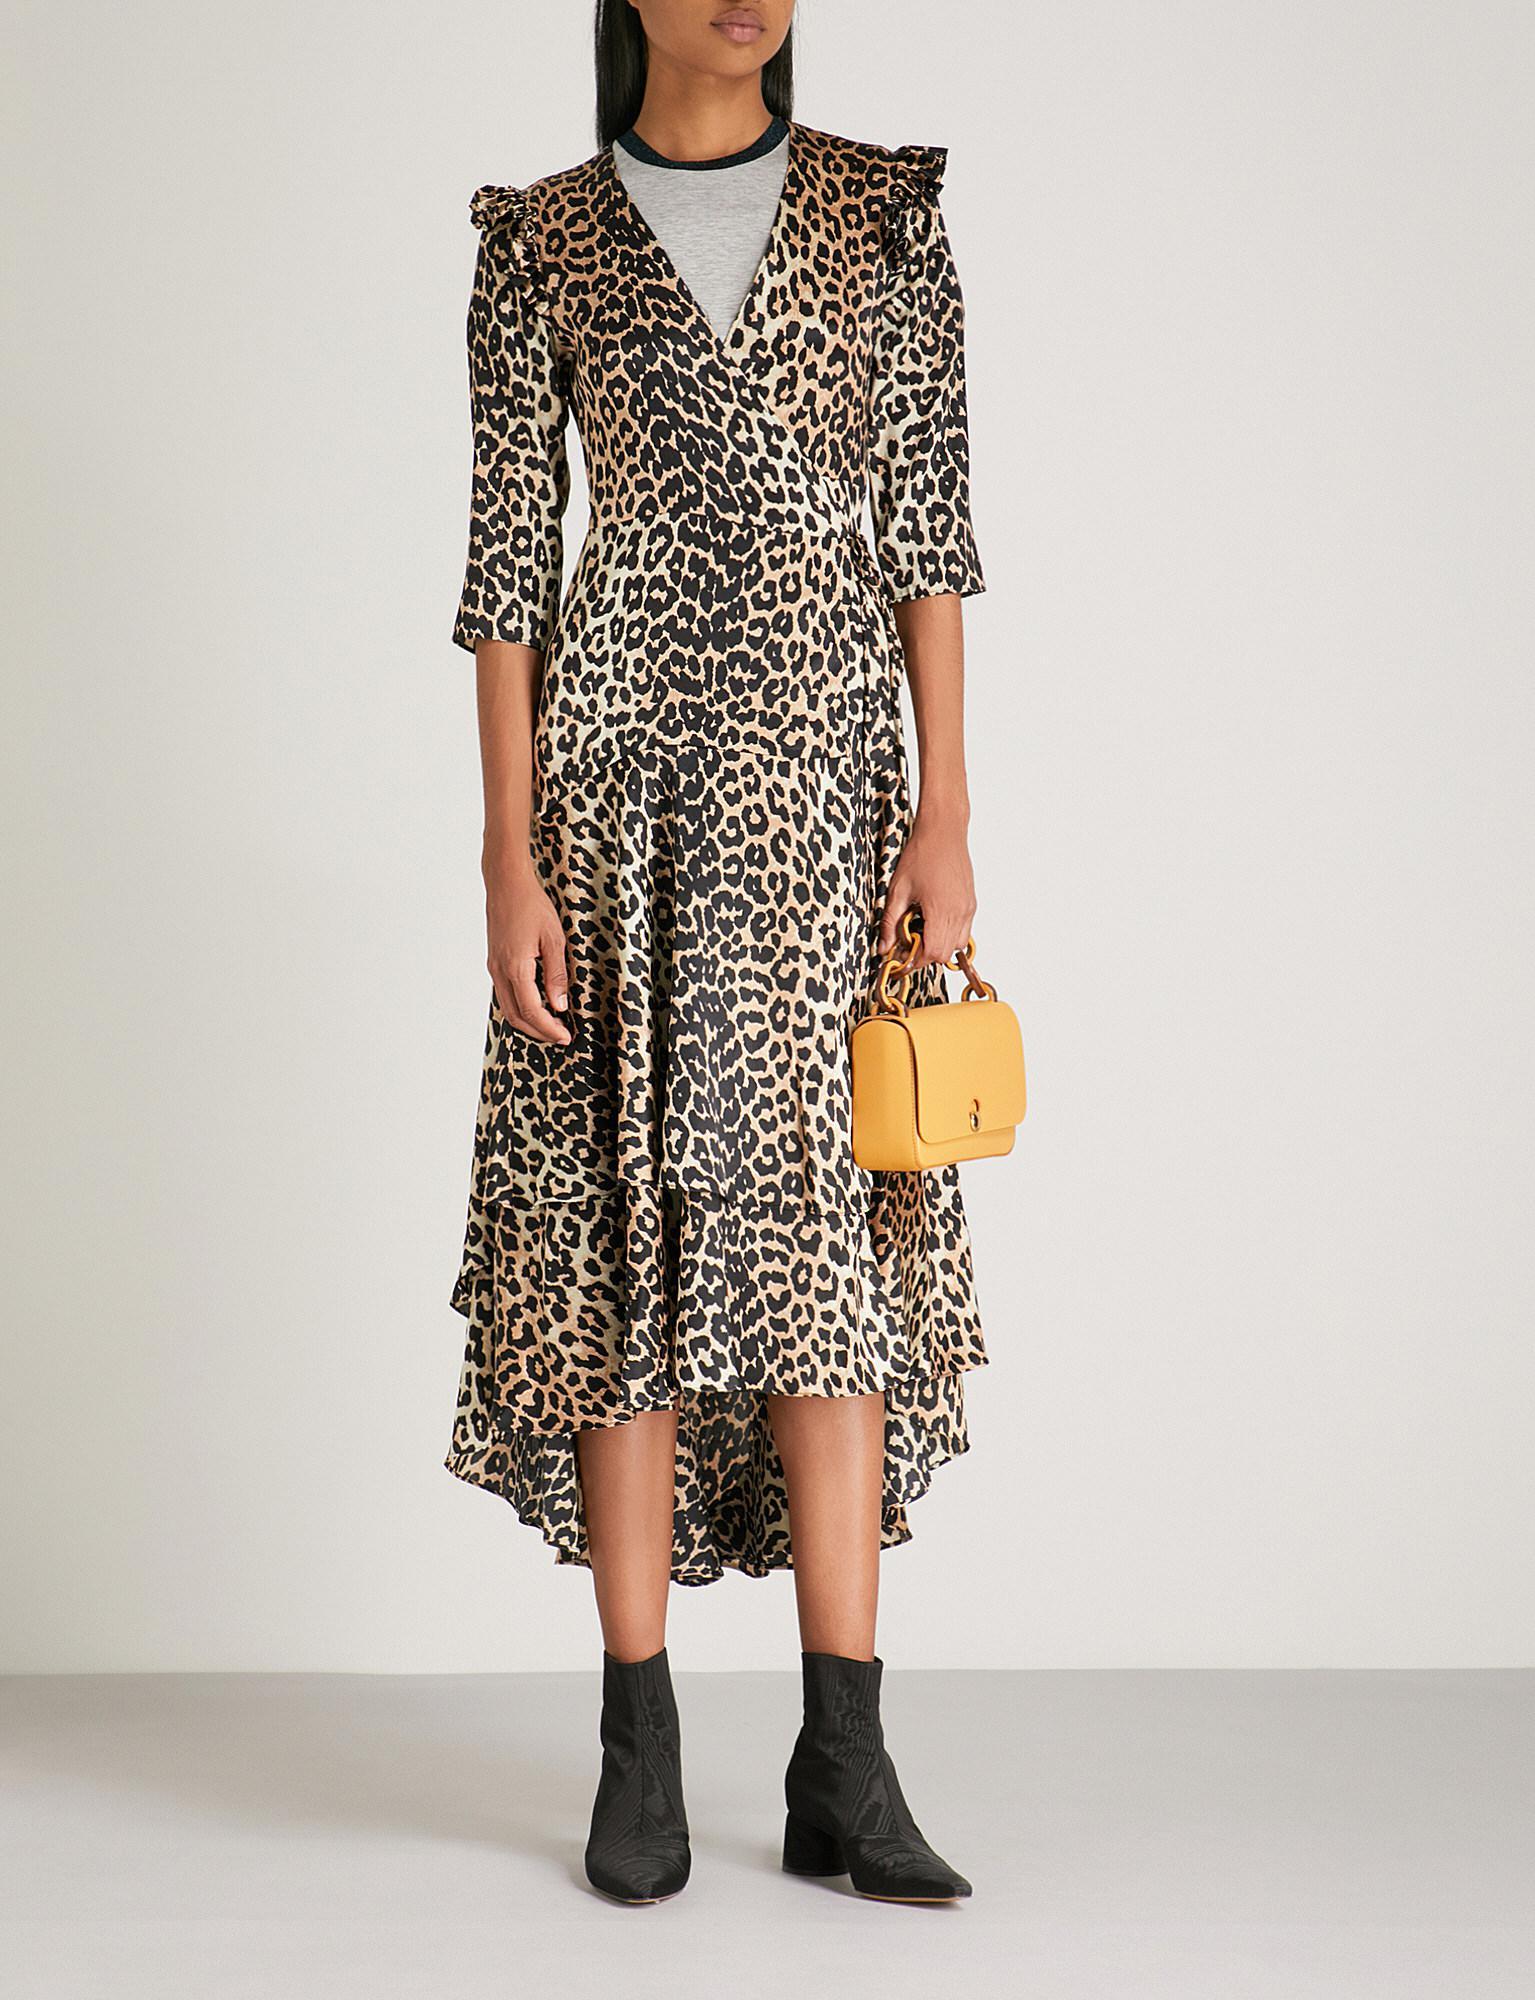 2cfa16698fd095 Ganni Calla Leopard-print Stretch-silk Wrap Dress in Black - Lyst